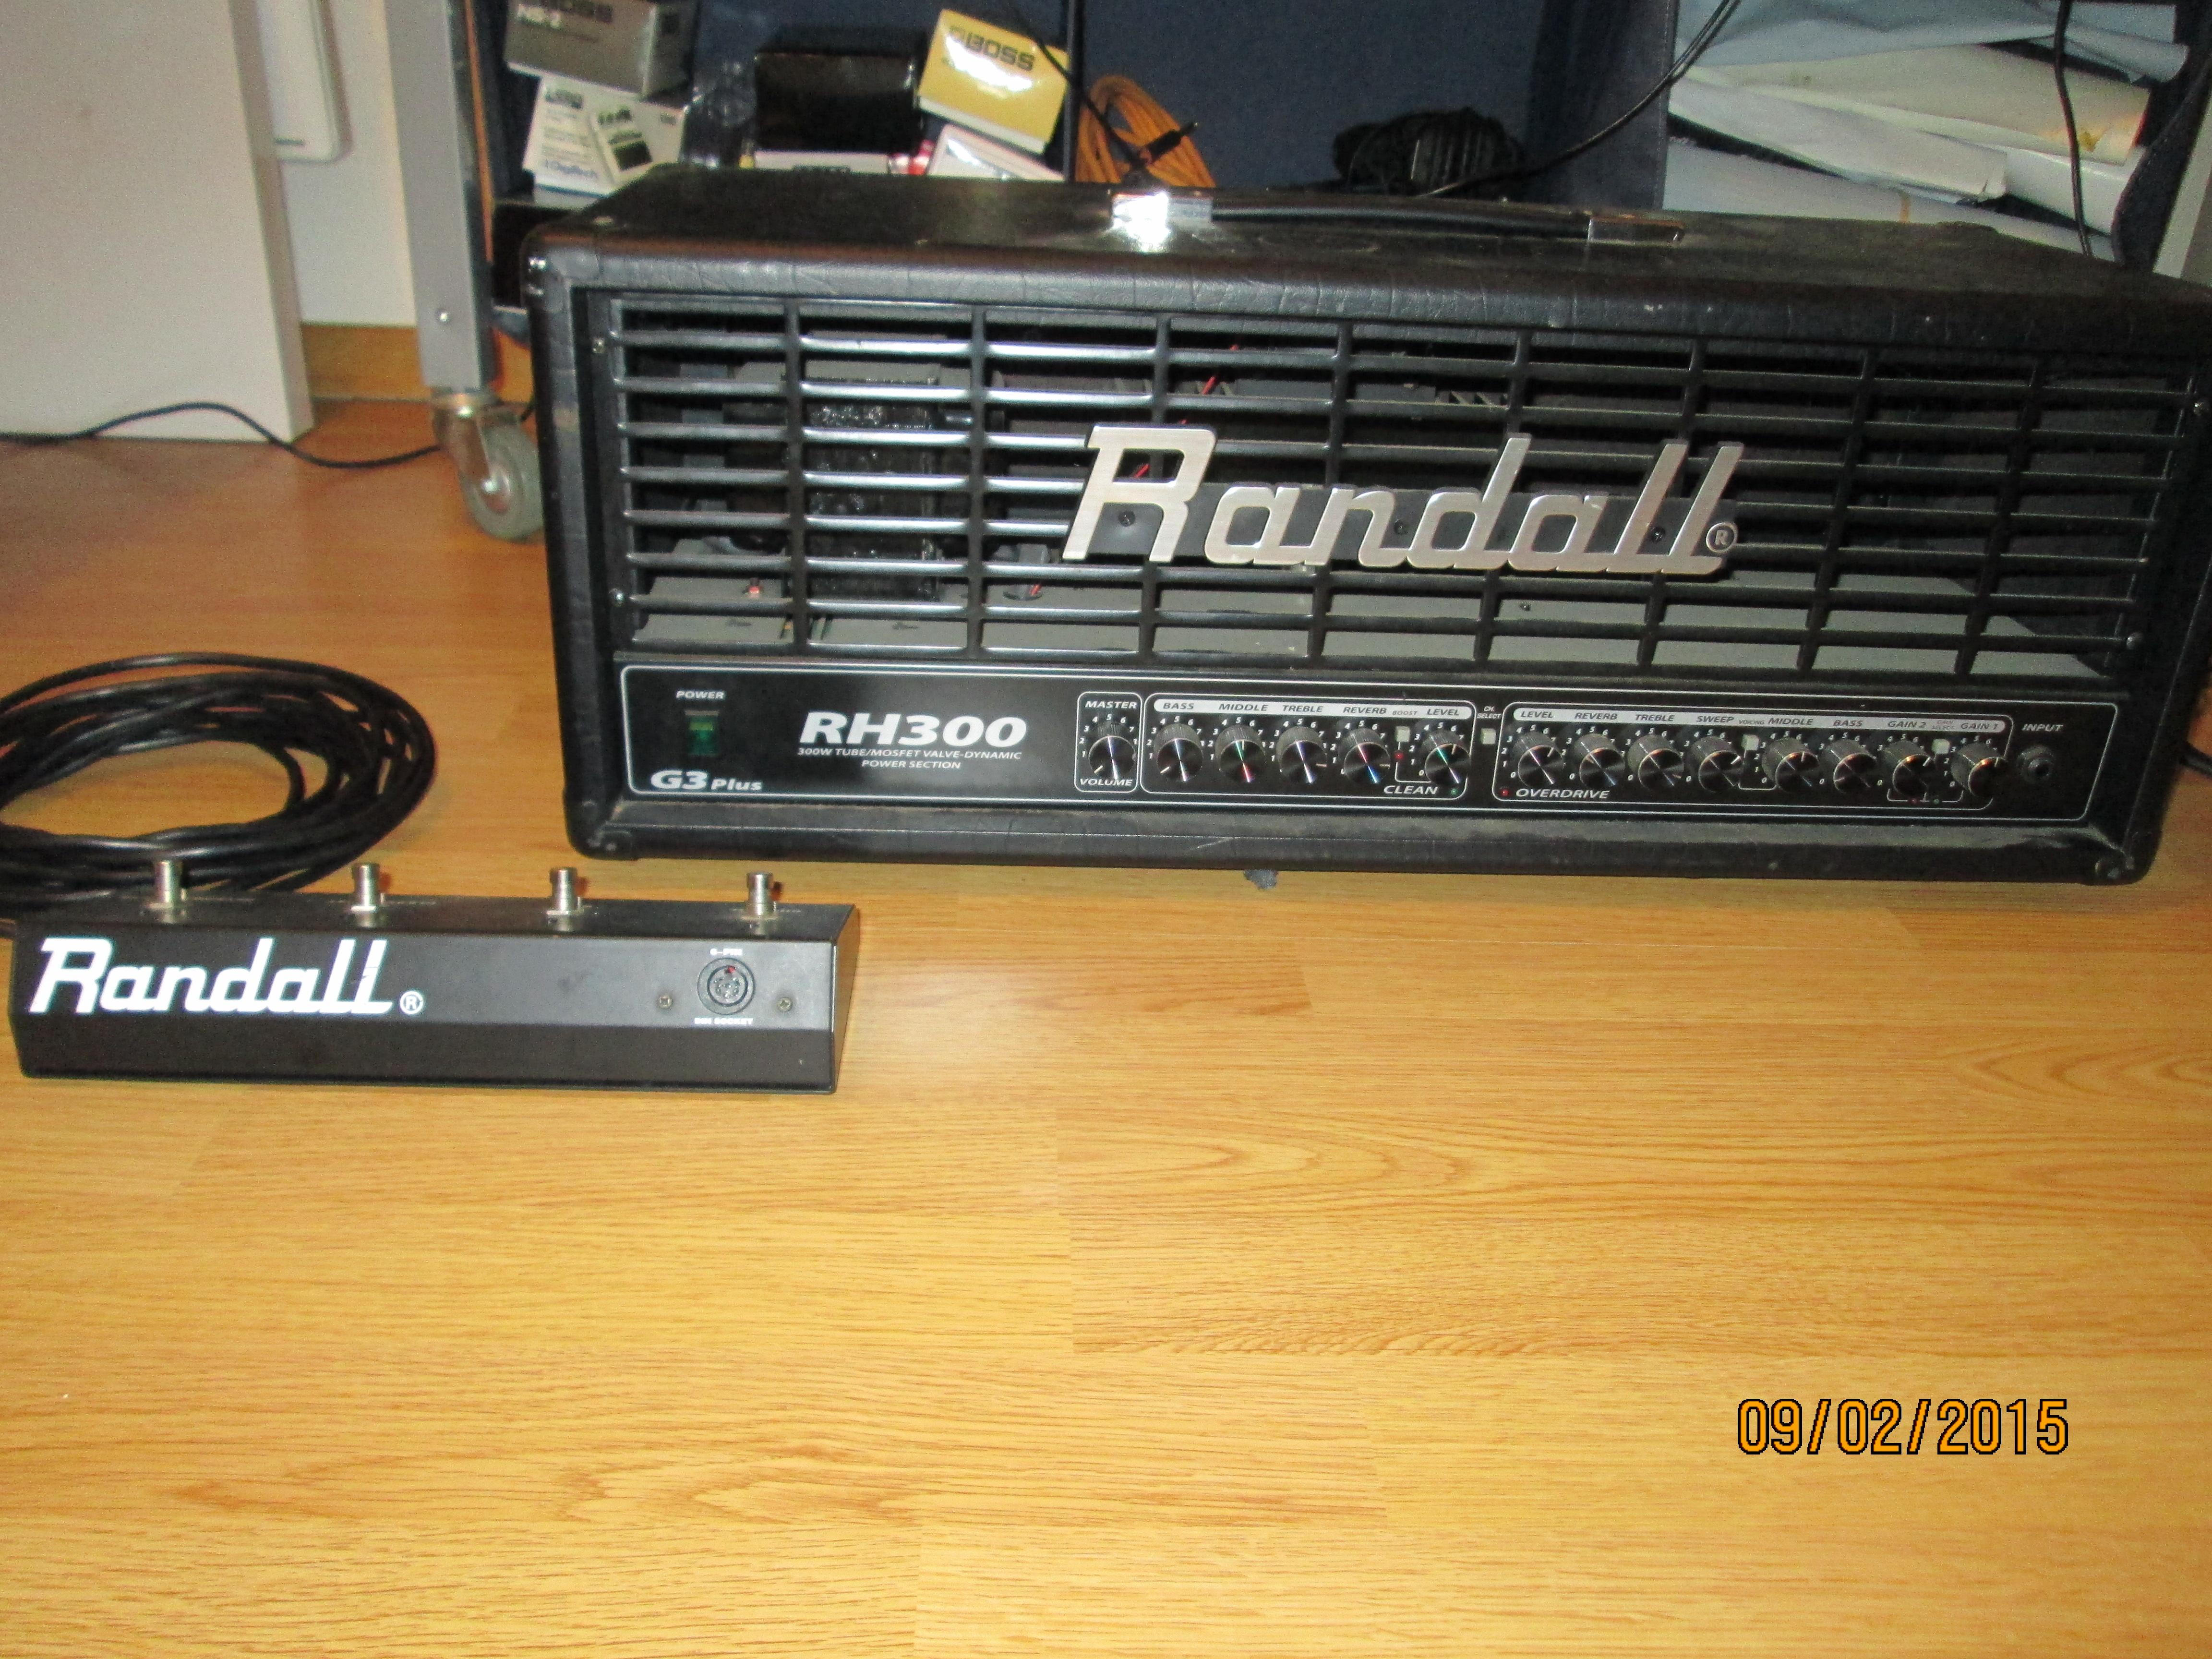 Randall rh300